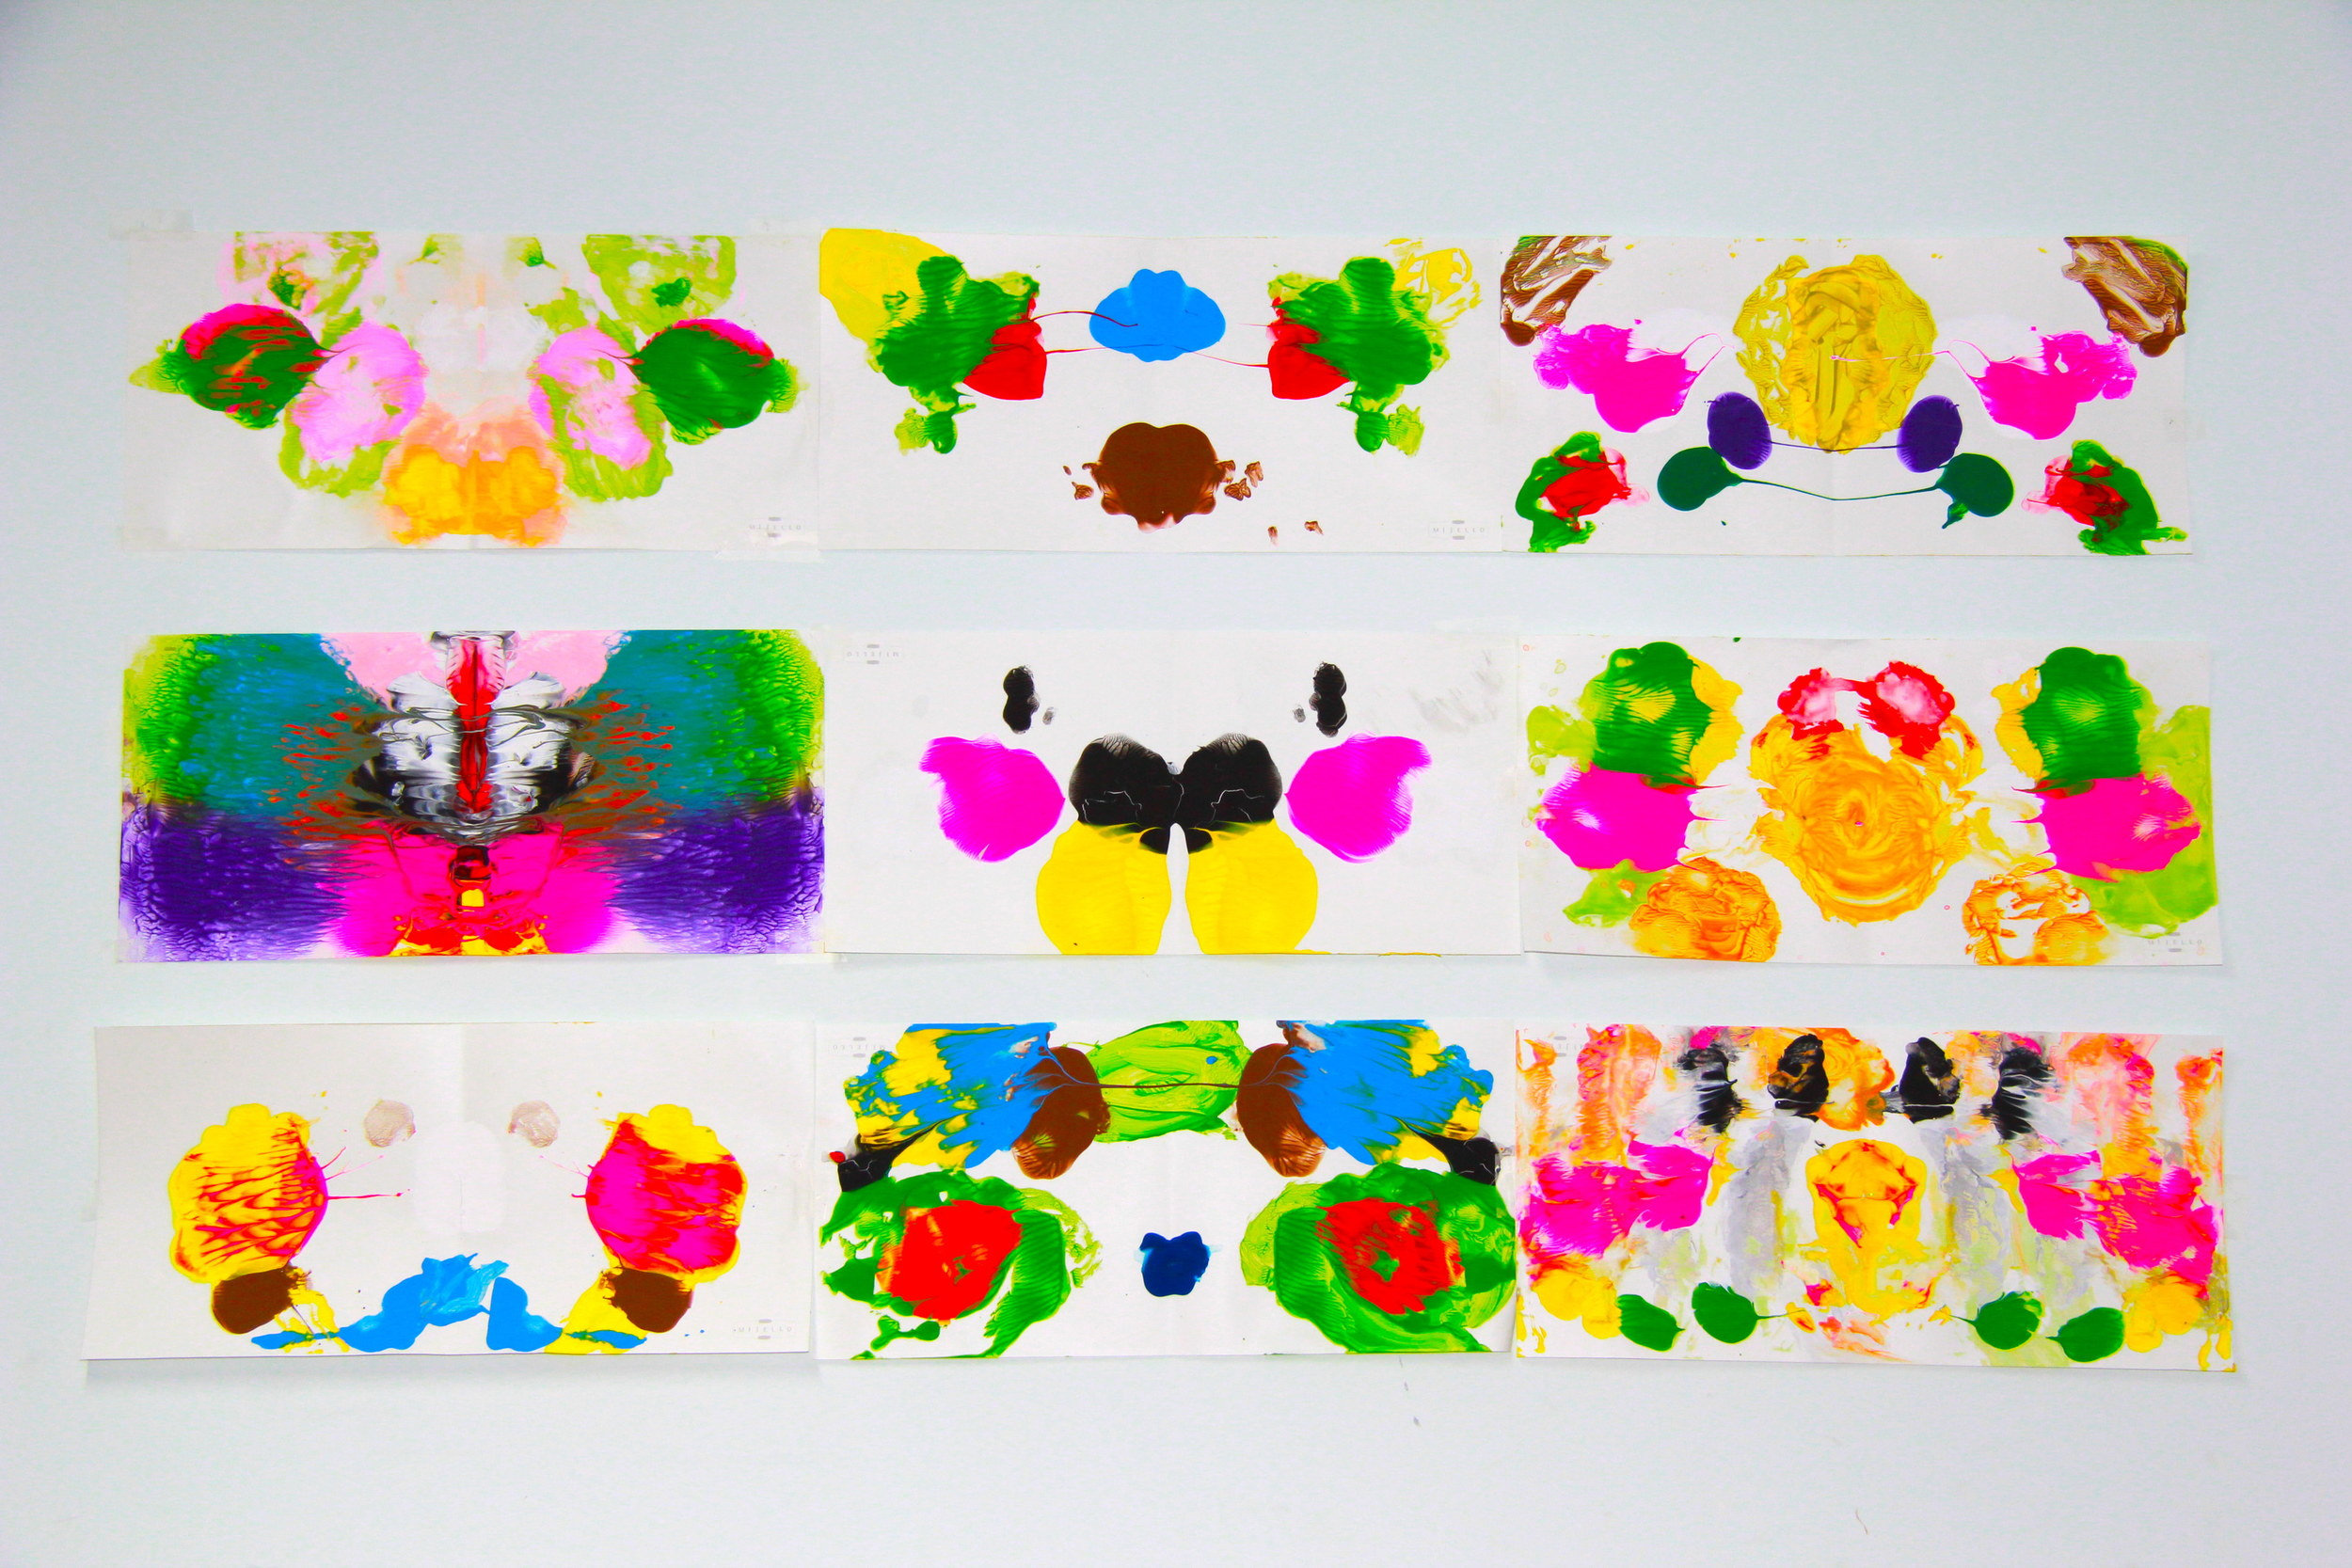 20150120213934-1620360-paper-palettes.JPG